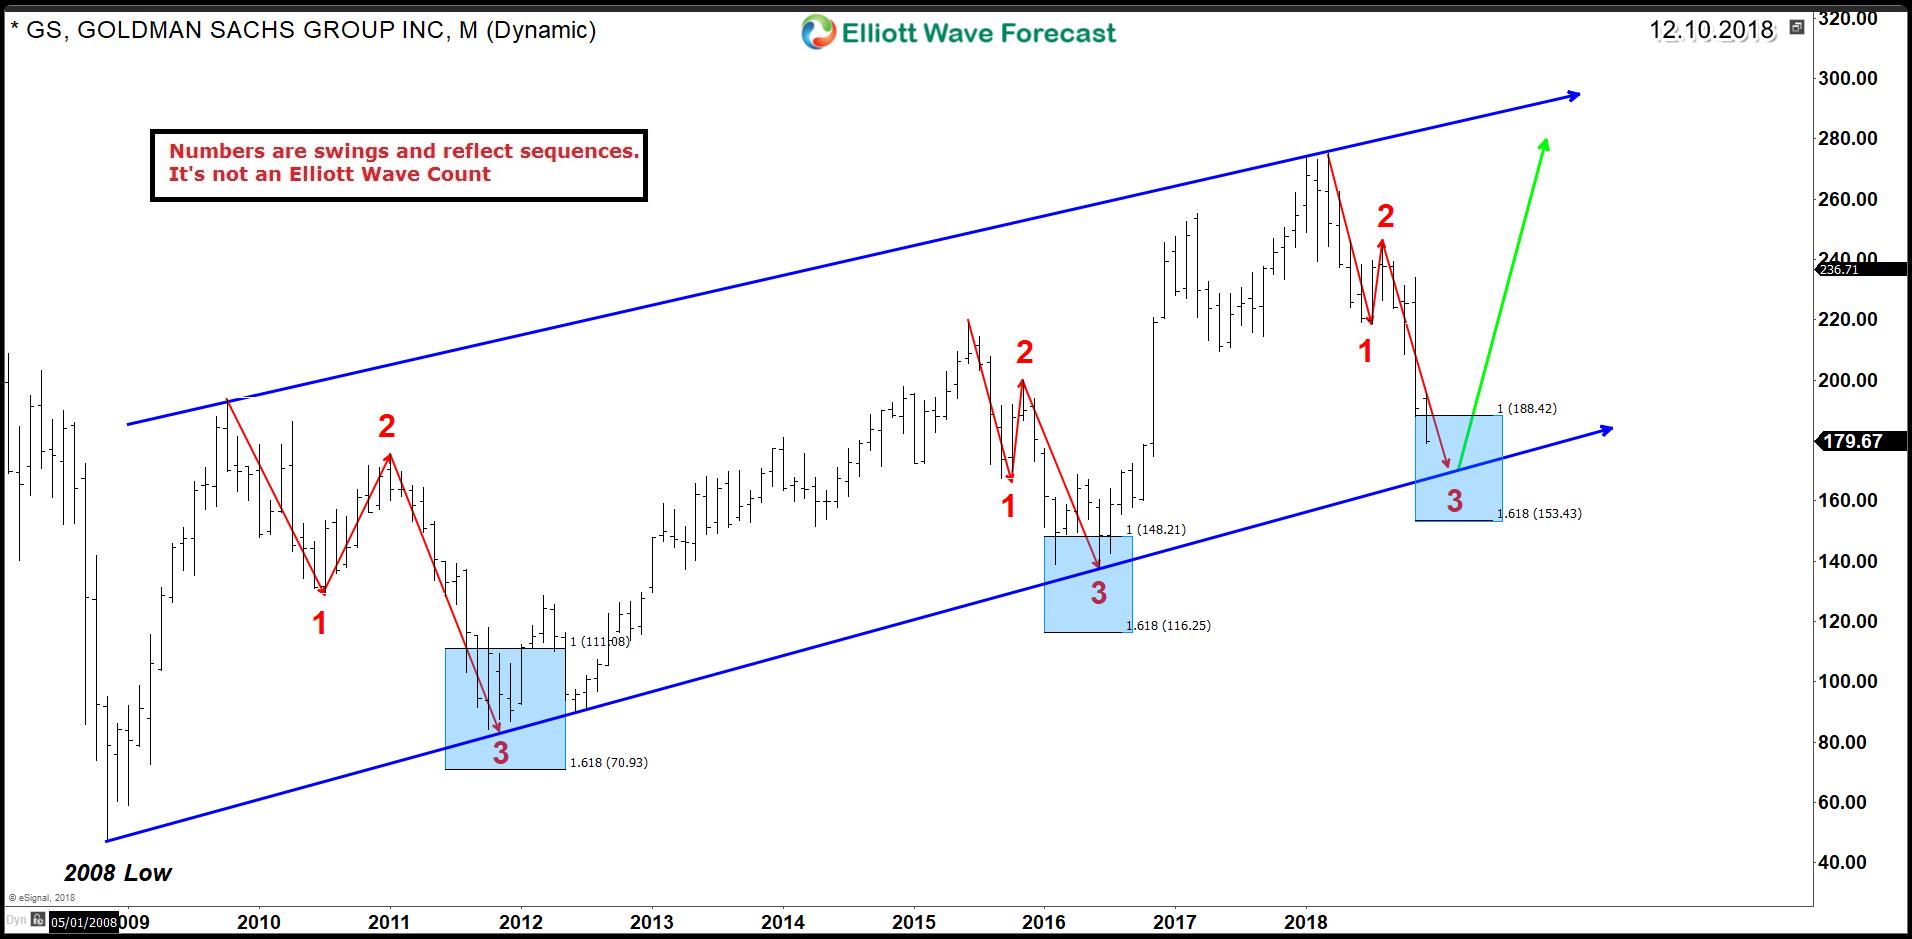 Goldman Sachs (NYSE: GS) – Bullish Trend is Still Intact